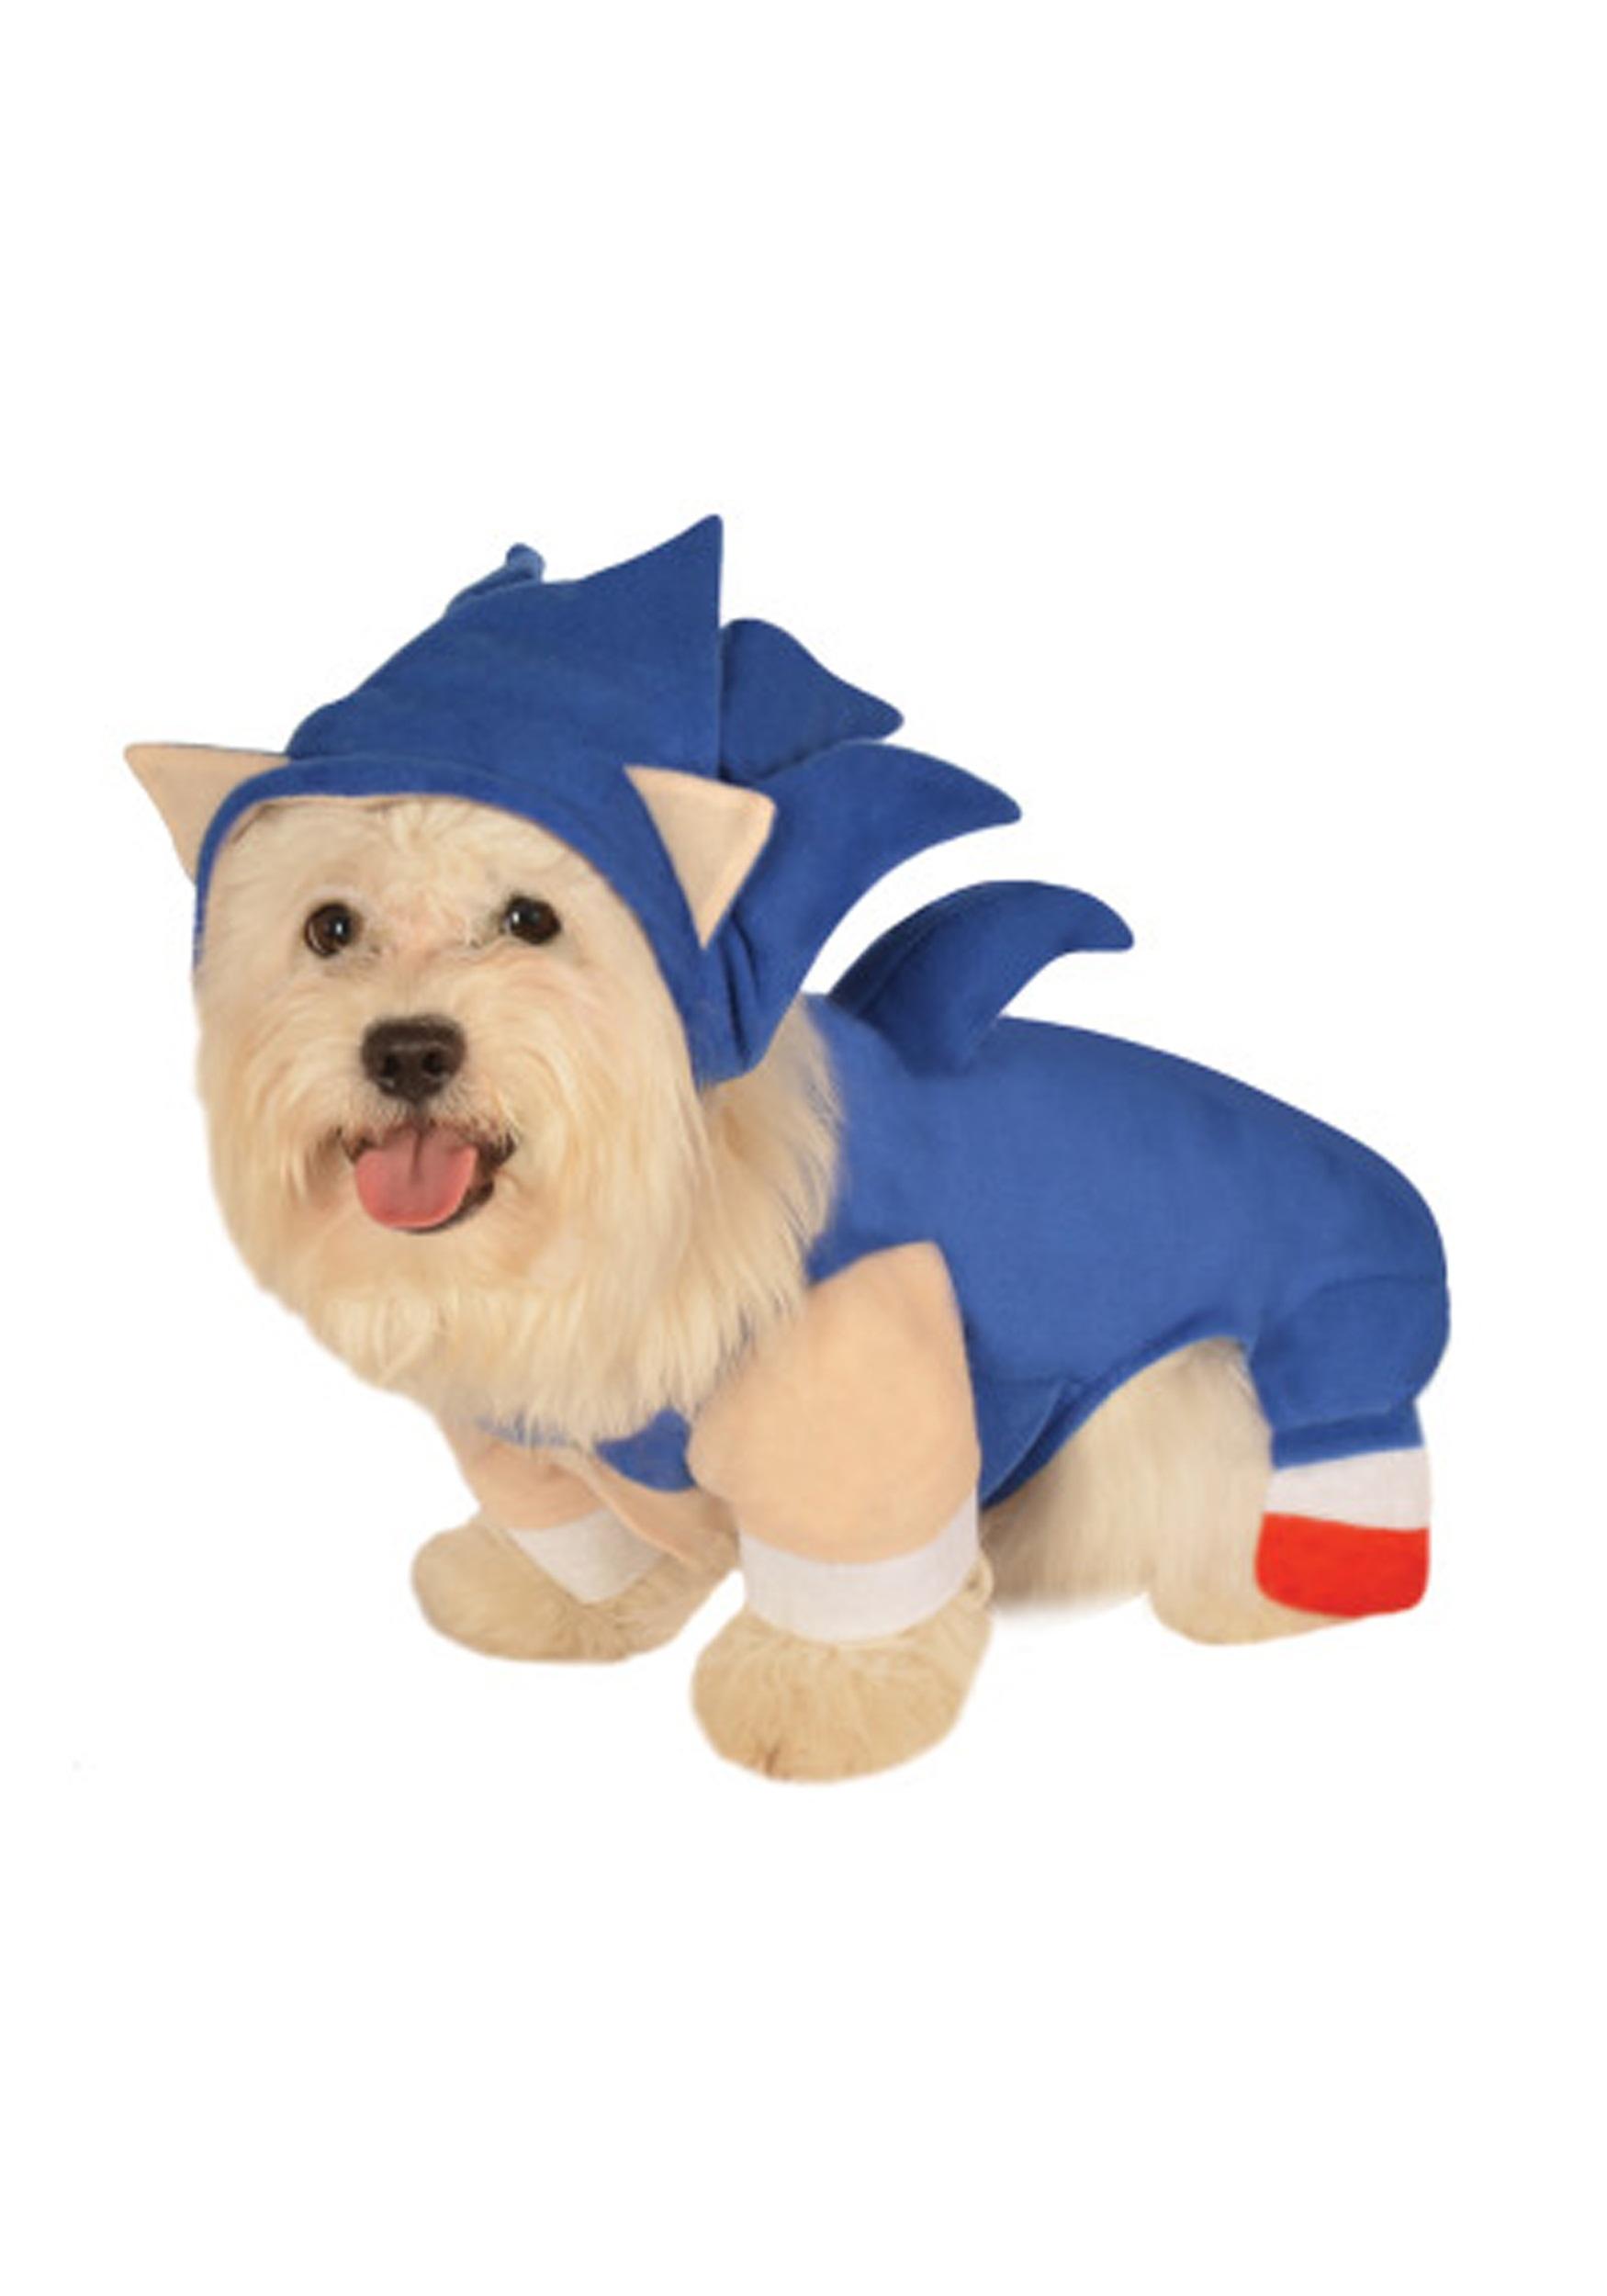 Sonic The Hedgehog Pet Costume Halloween Costume Ideas 2019